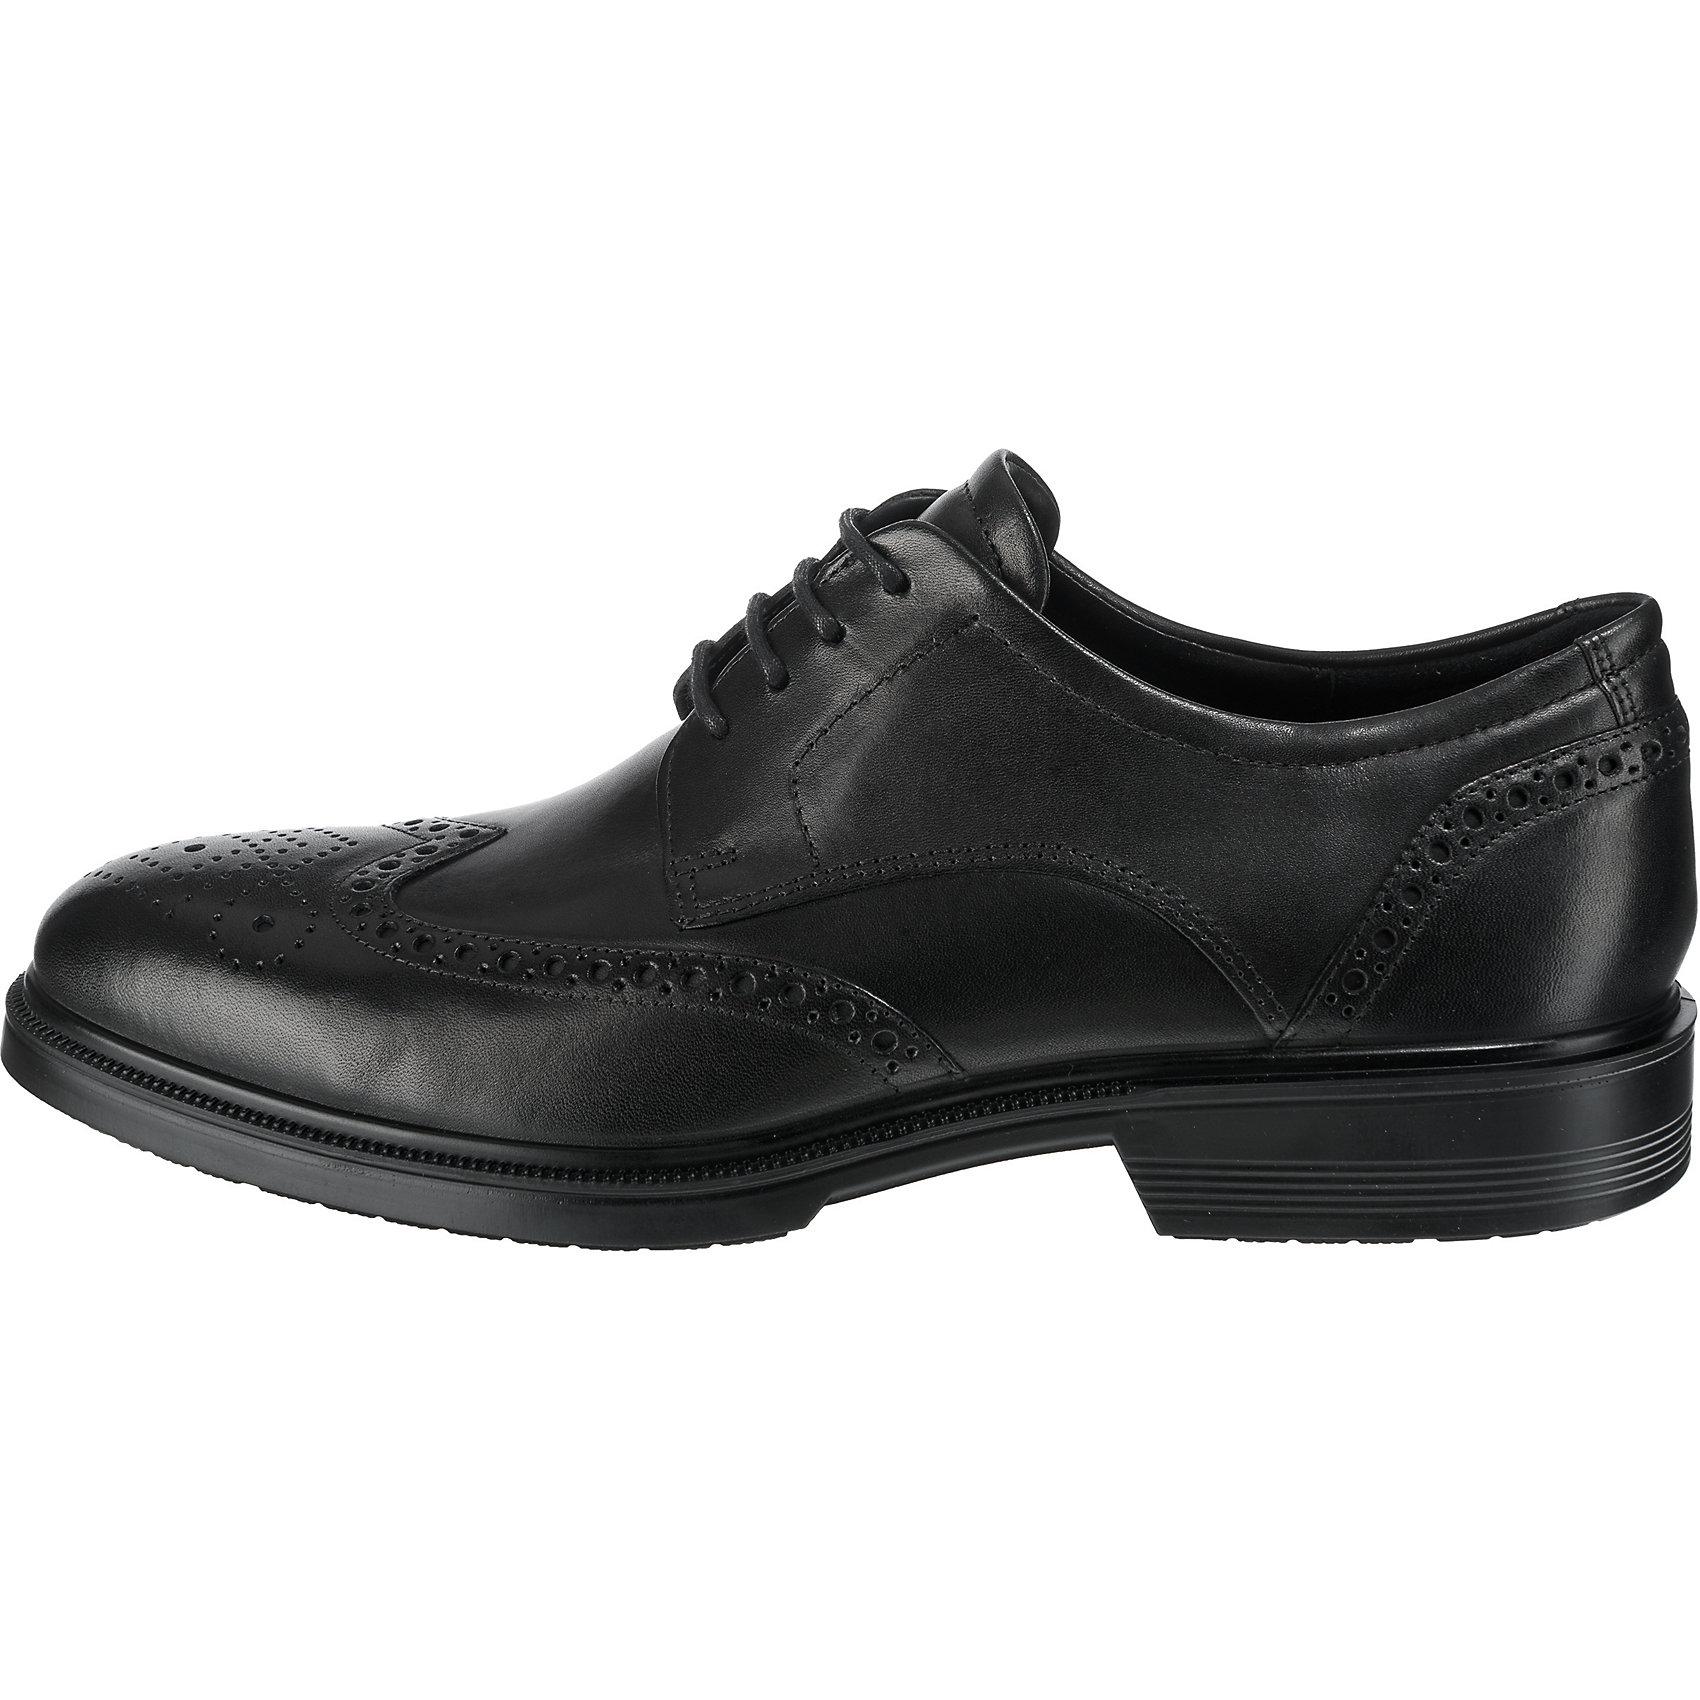 Neu ecco Lisbon Business-Schnürschuhe Herren 7572078 für Herren Business-Schnürschuhe schwarz c54939